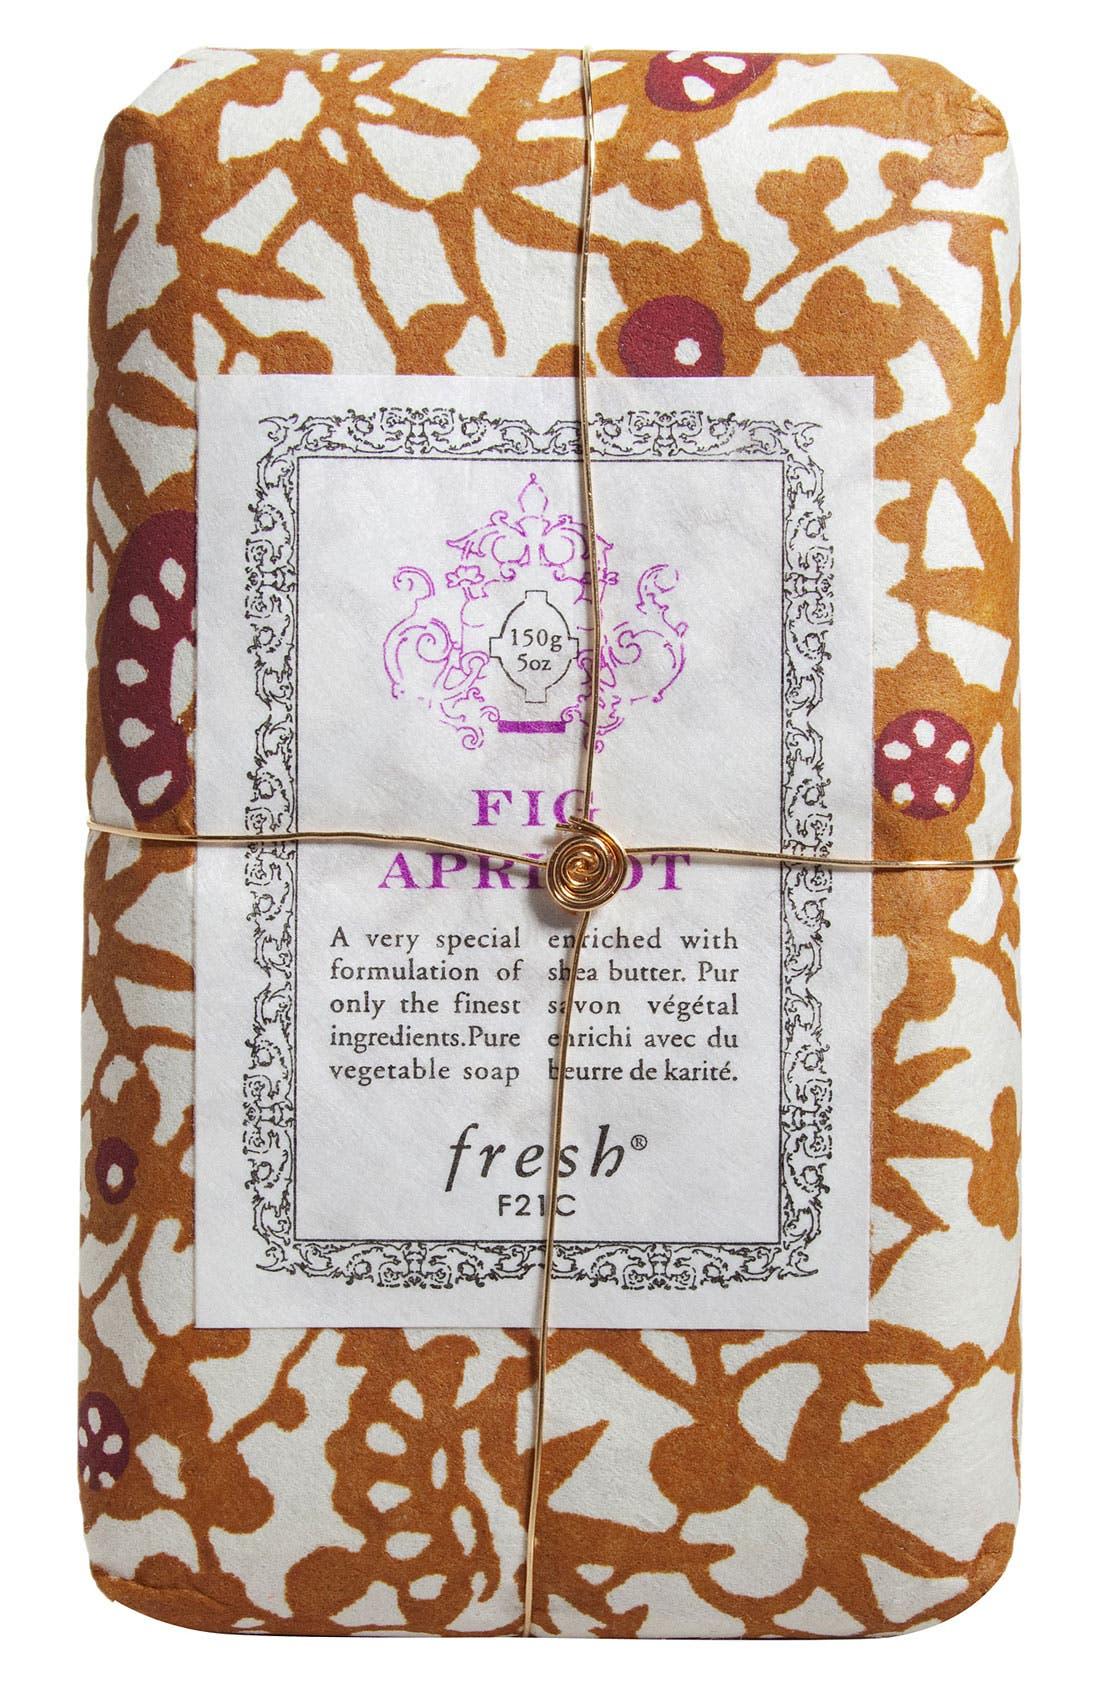 Fresh® Fig Apricot Petit Soap